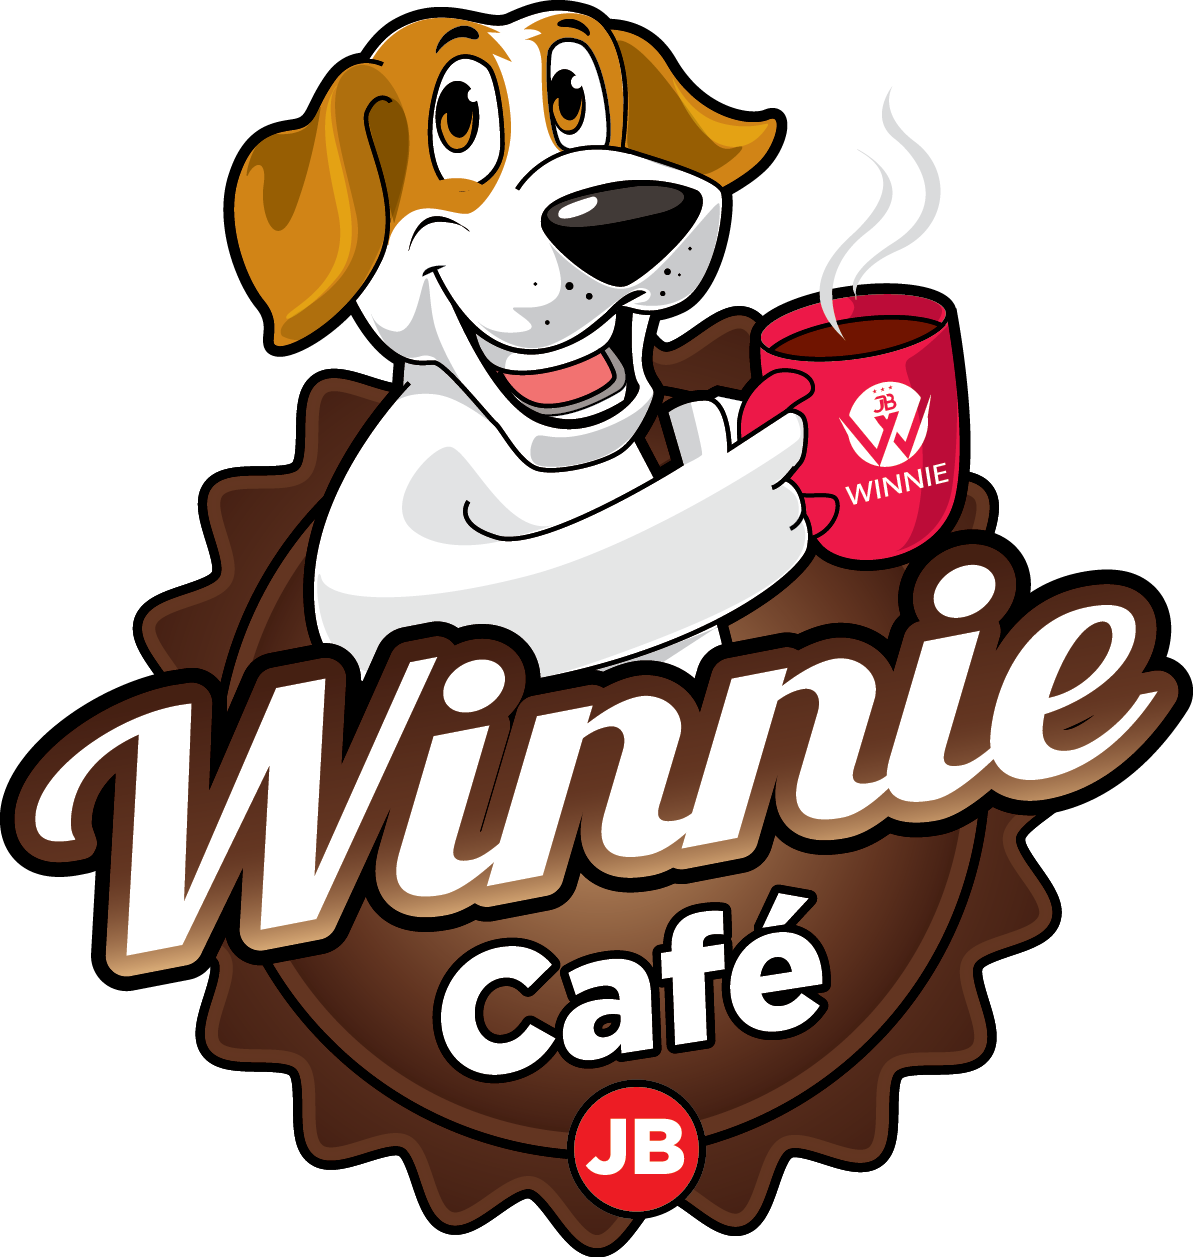 Winnie.sk